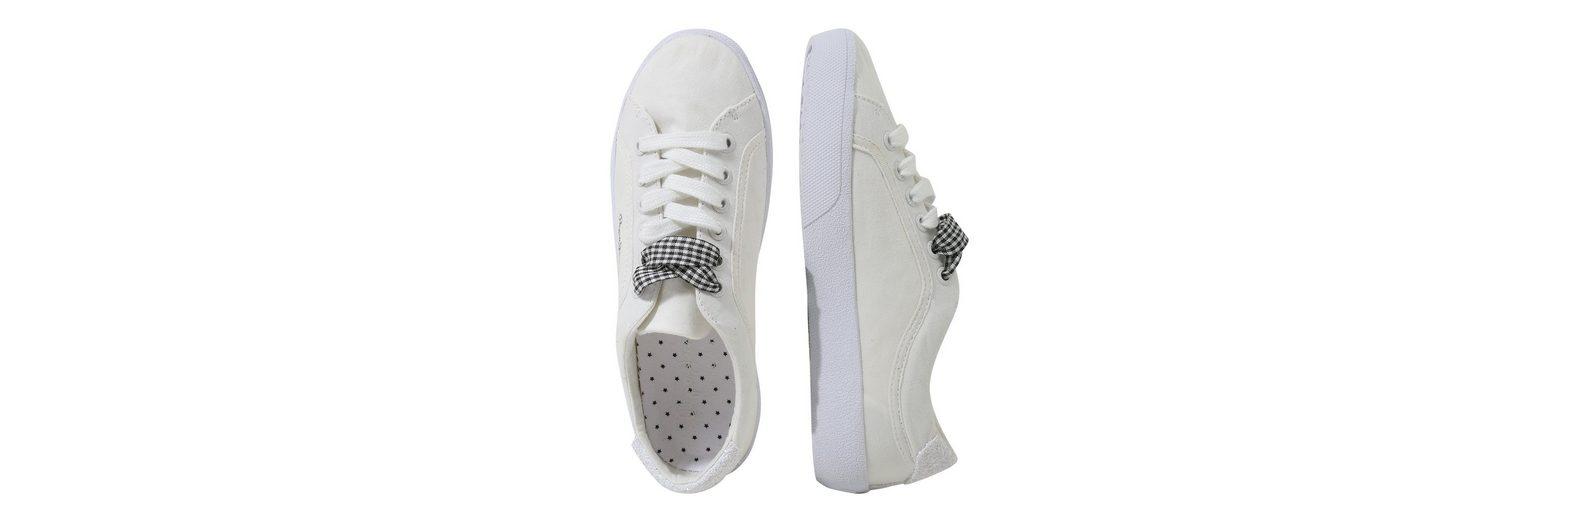 Pepe Jeans Rene Skate Sneaker Billige Ebay Verkauf Echten 6YGIfO